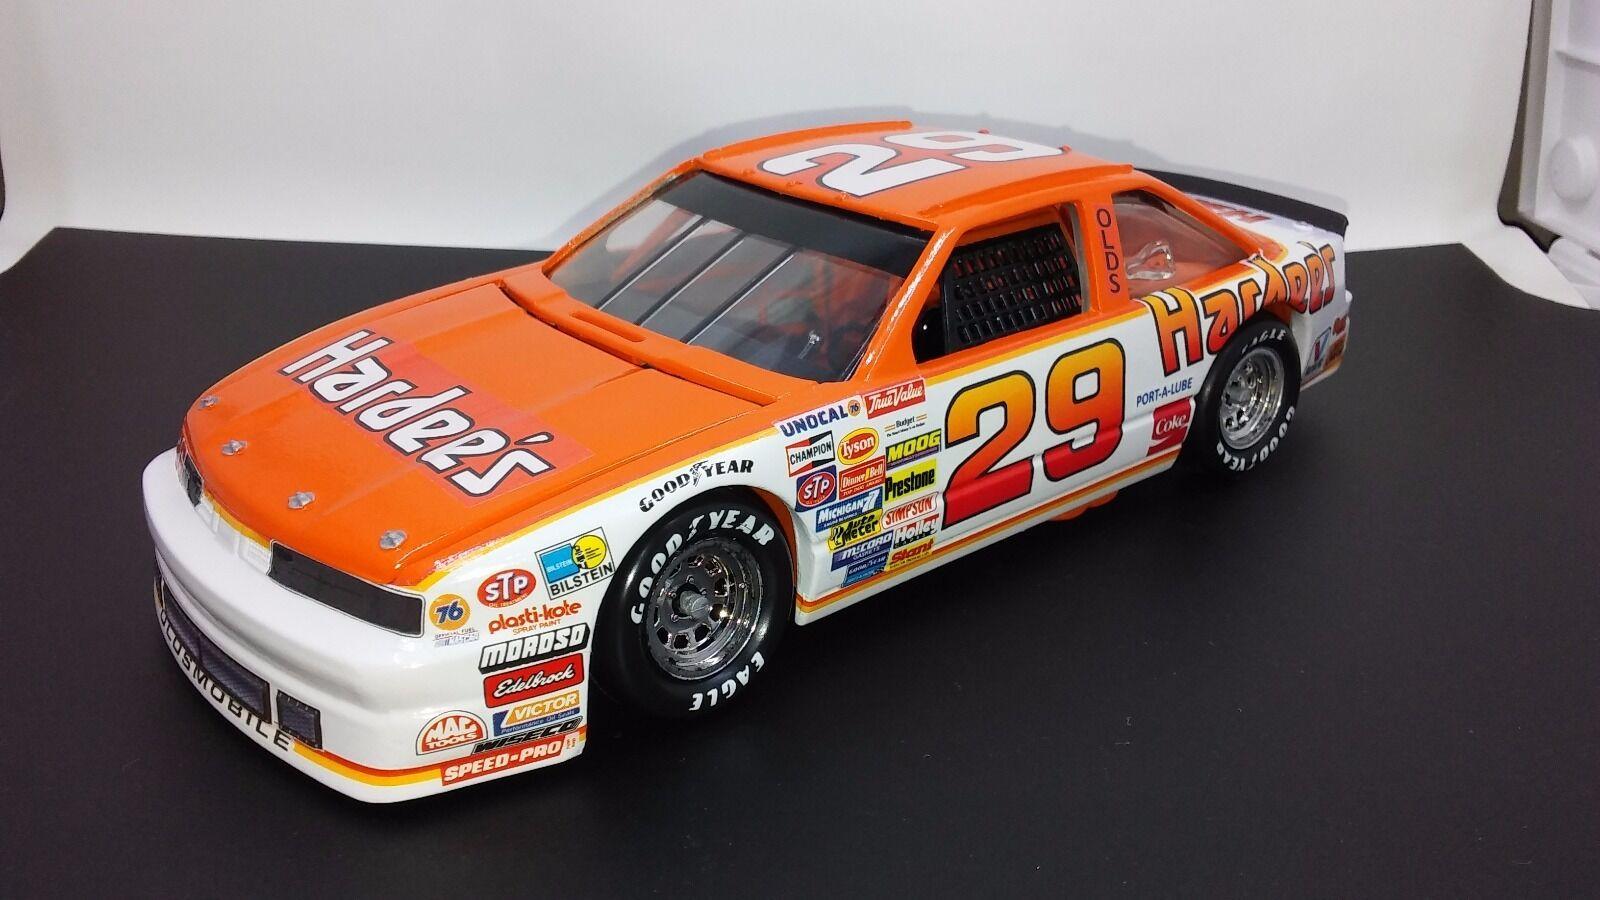 Raro 1988 Cale Yarborough NASCAR Winston Cup Series Hardees 1 24 Diecast